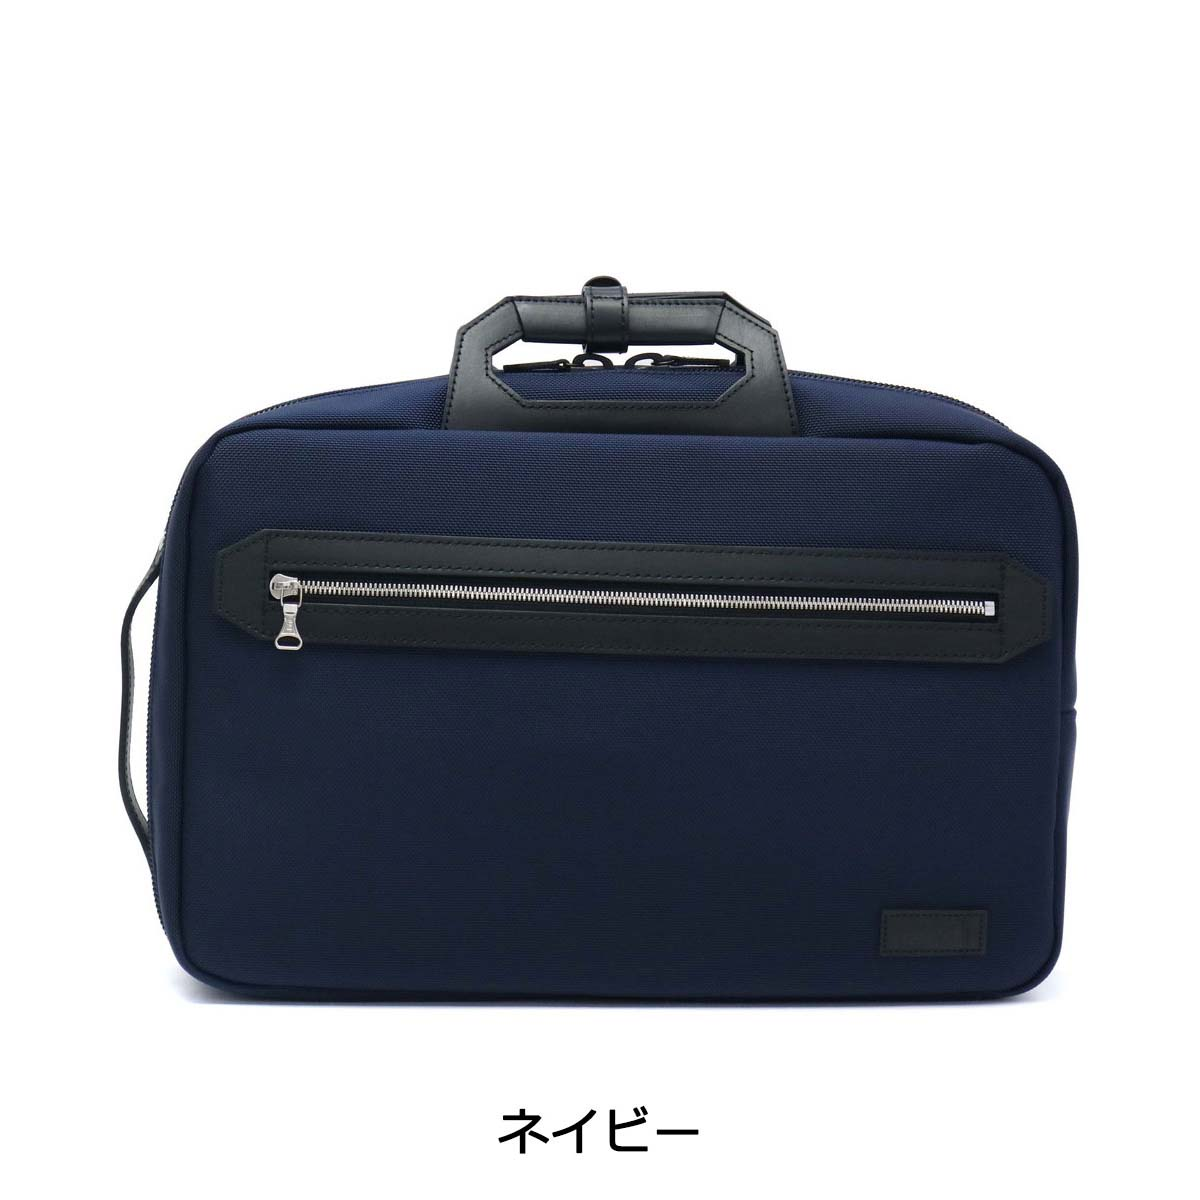 bd7bf5dc1285 ENGAGEMENT Briefcase 2 WAY Body Bag Business Bag SLING BRIEF diagonal A4  Commuter Men EGBF - 014